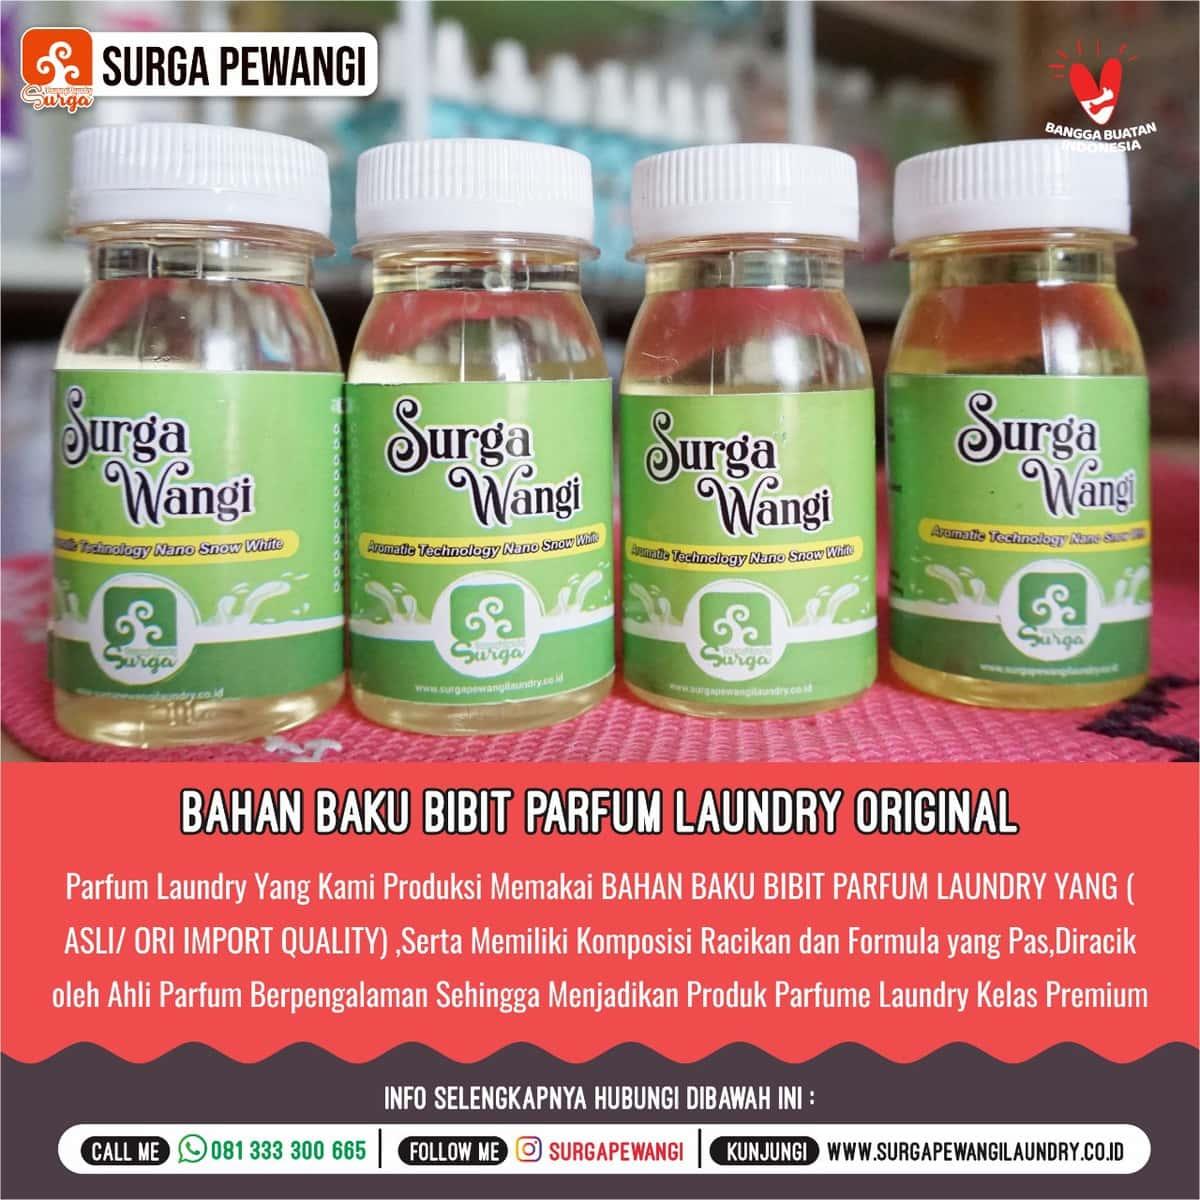 f76dd94d 3987 4526 8a9f 7e9147d299b7 - Bibit Parfum Laundry WaterBase Original Kualitas Super